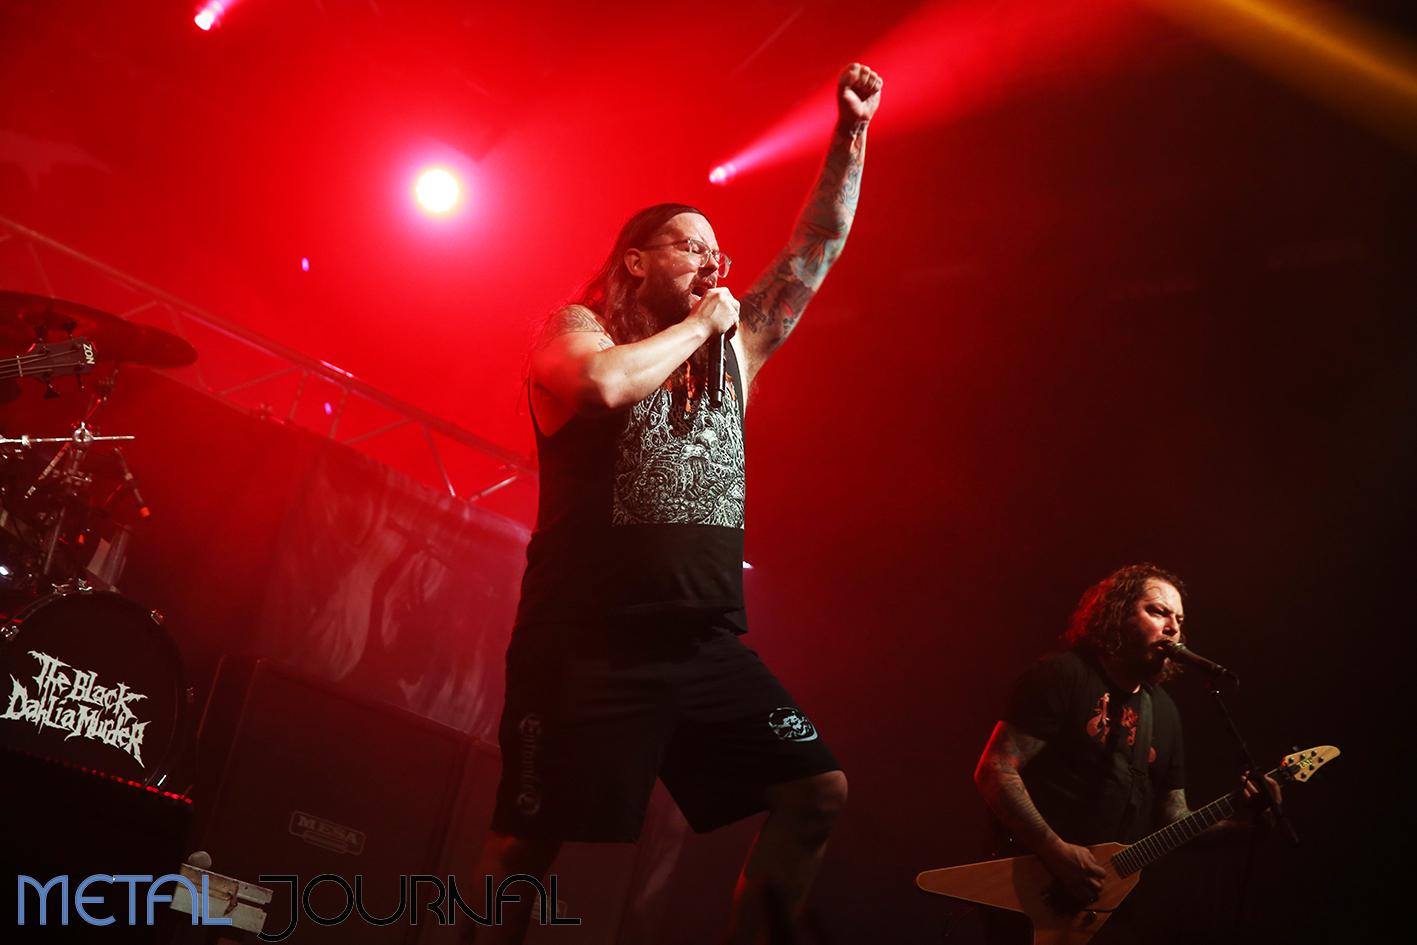 the black dahlia murder - metal journal 2019 pic 3